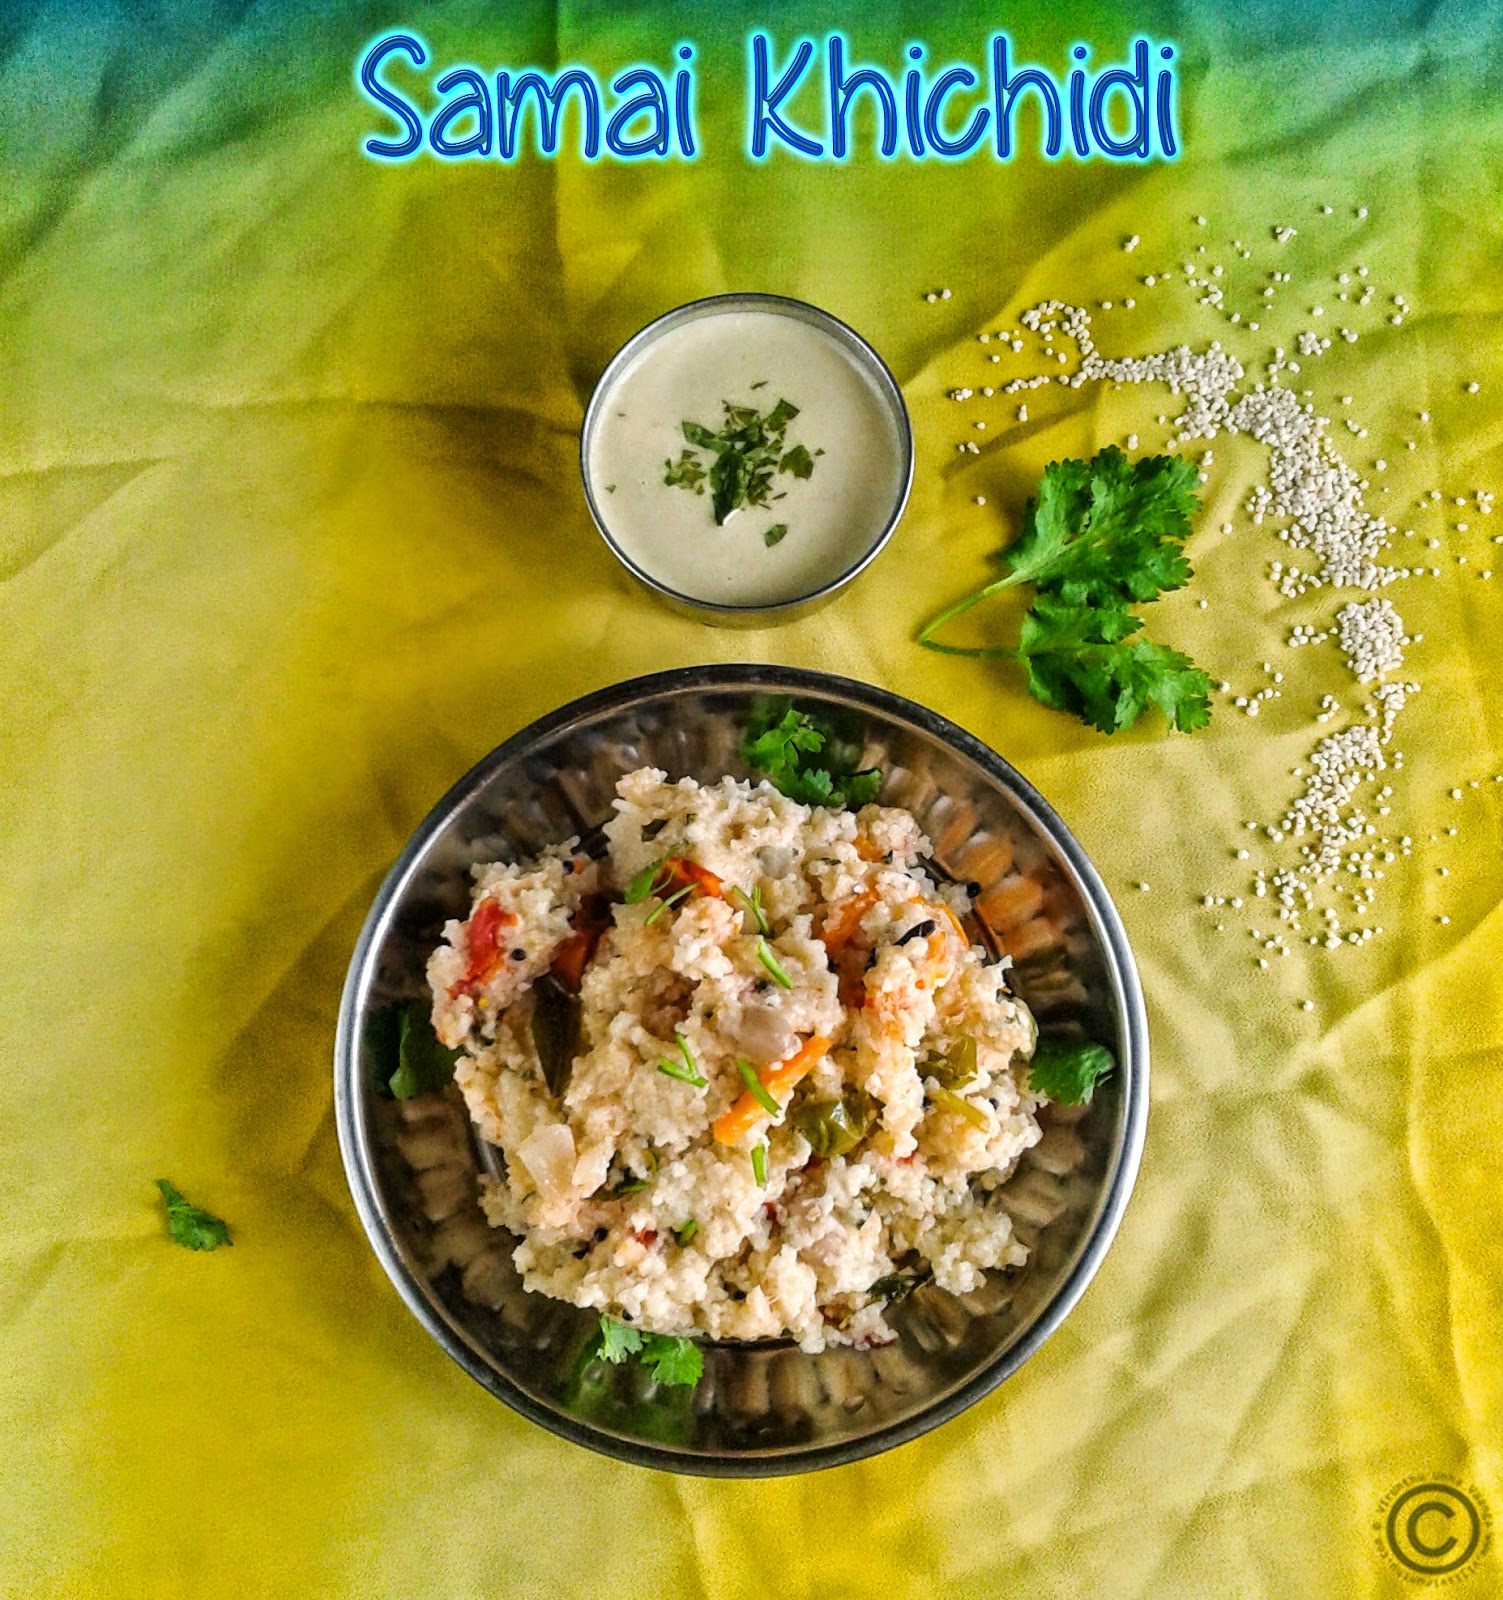 samai-khichidi-recipe